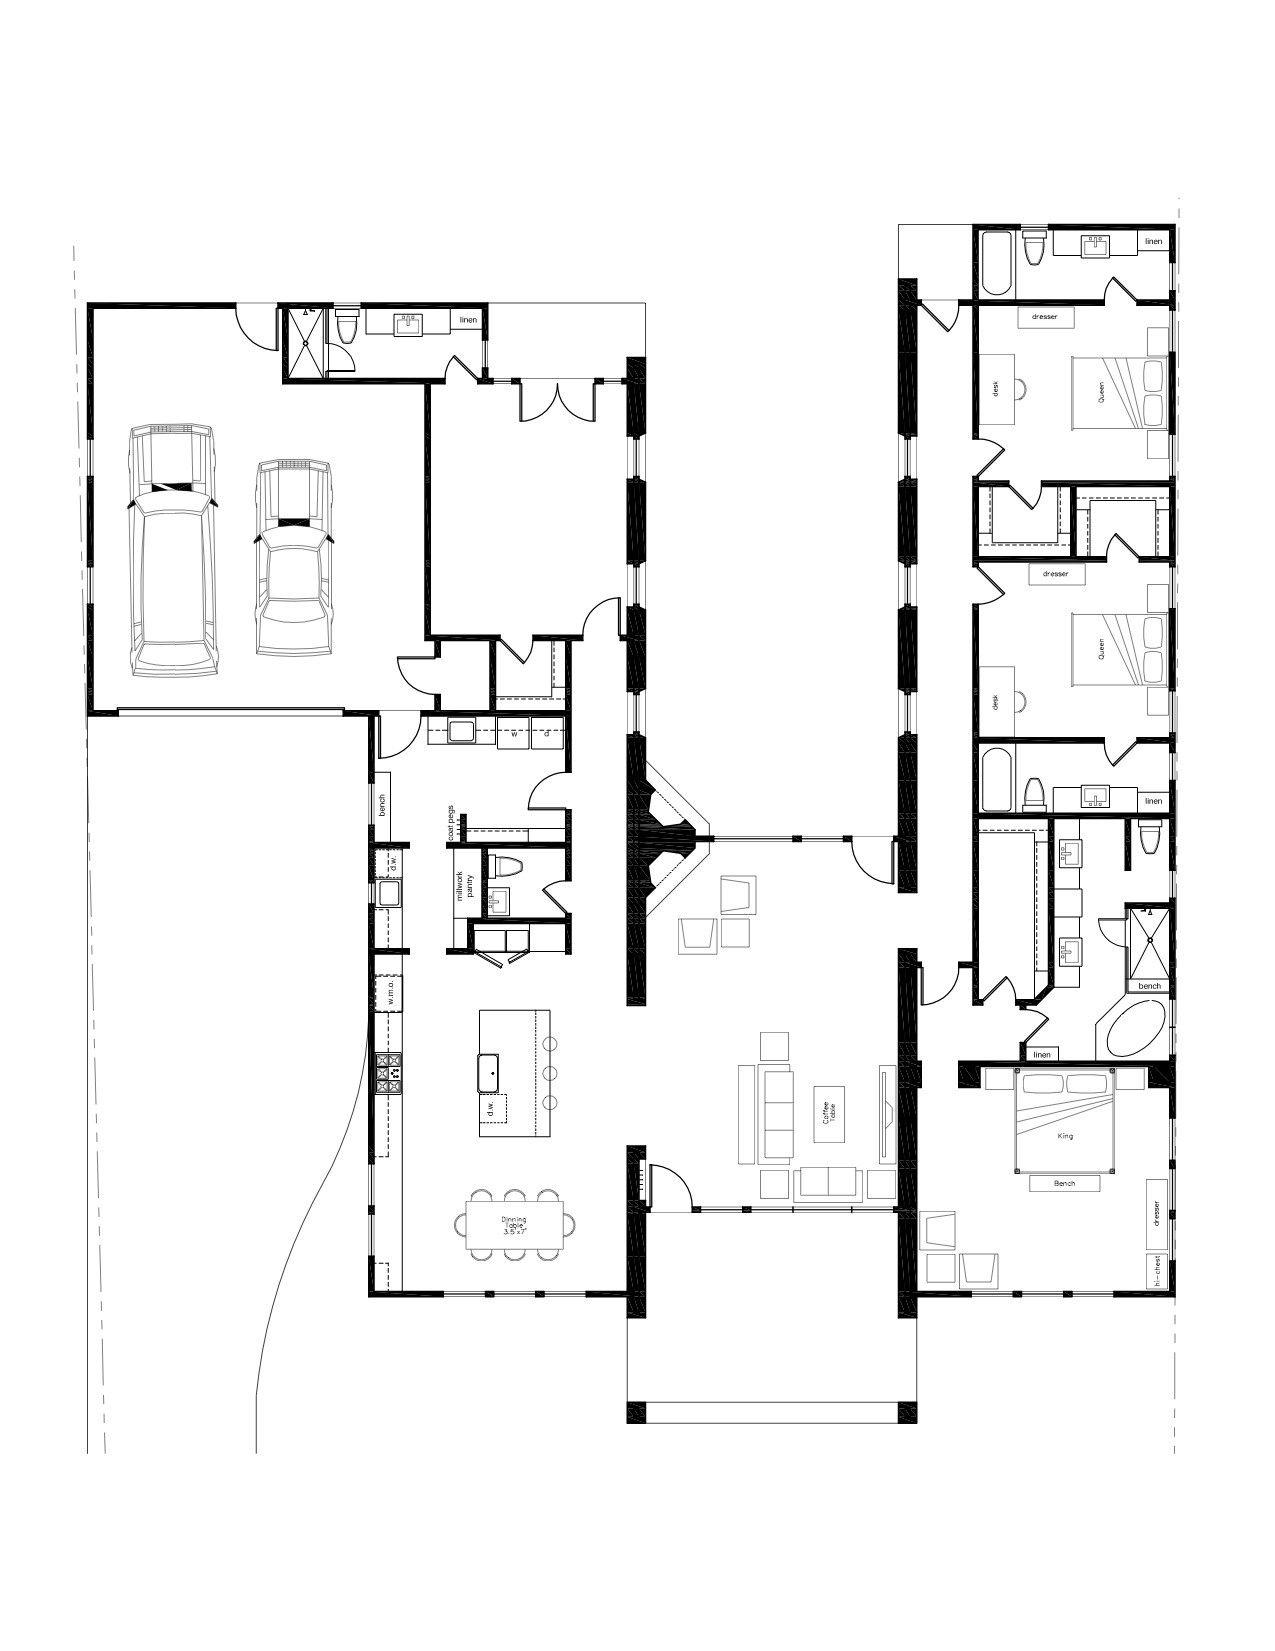 Floor Plans Mcm League Modern Floor Plans Unique Floor Plans Floor Plans